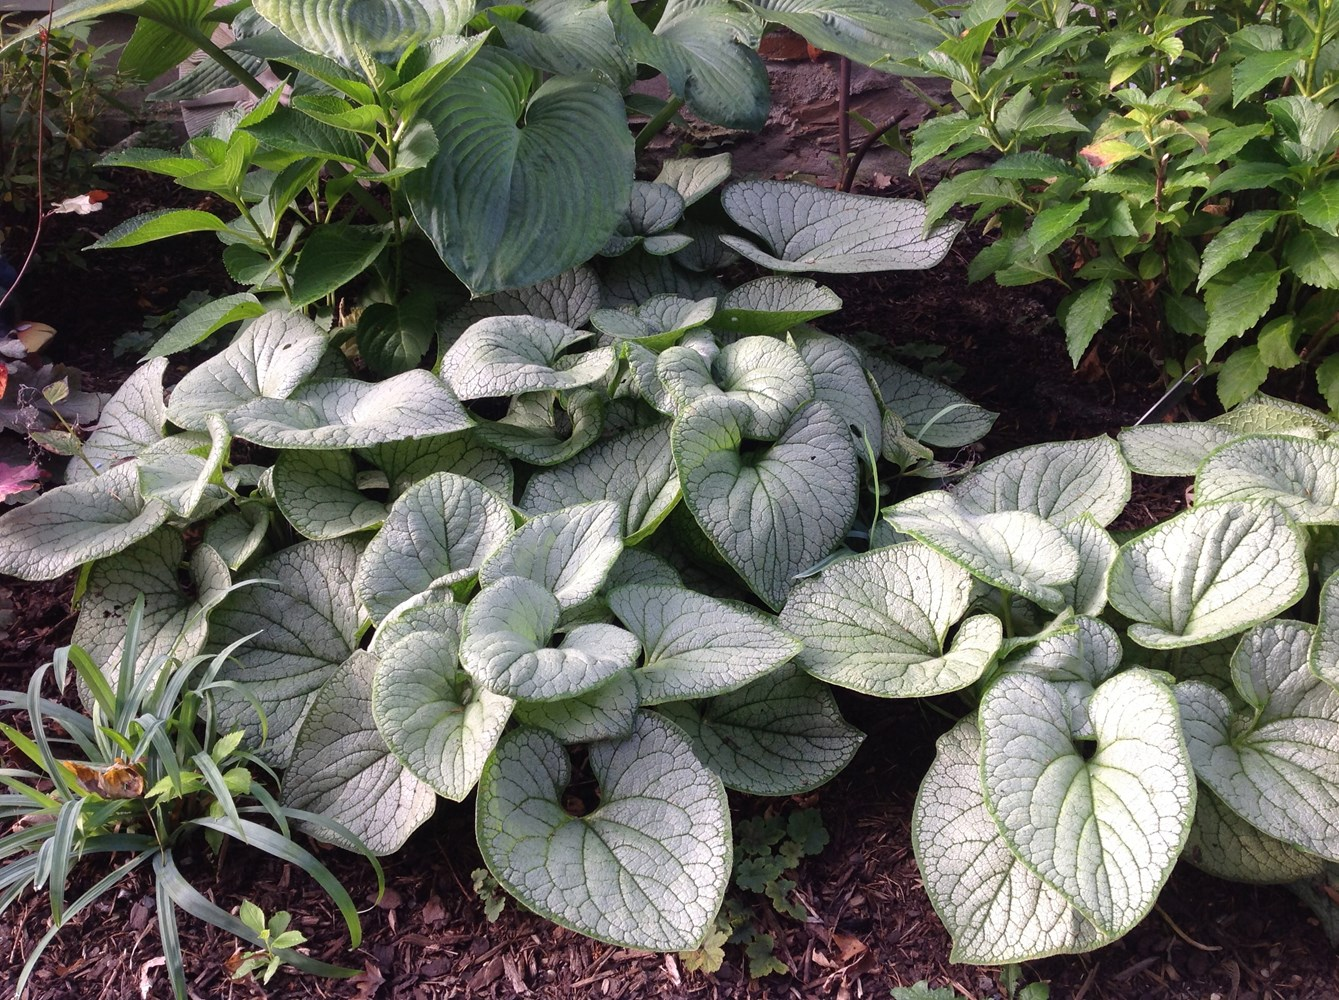 Website/Plants/2144399034/Images/Gallery/b_silverheart_03.0.jpg